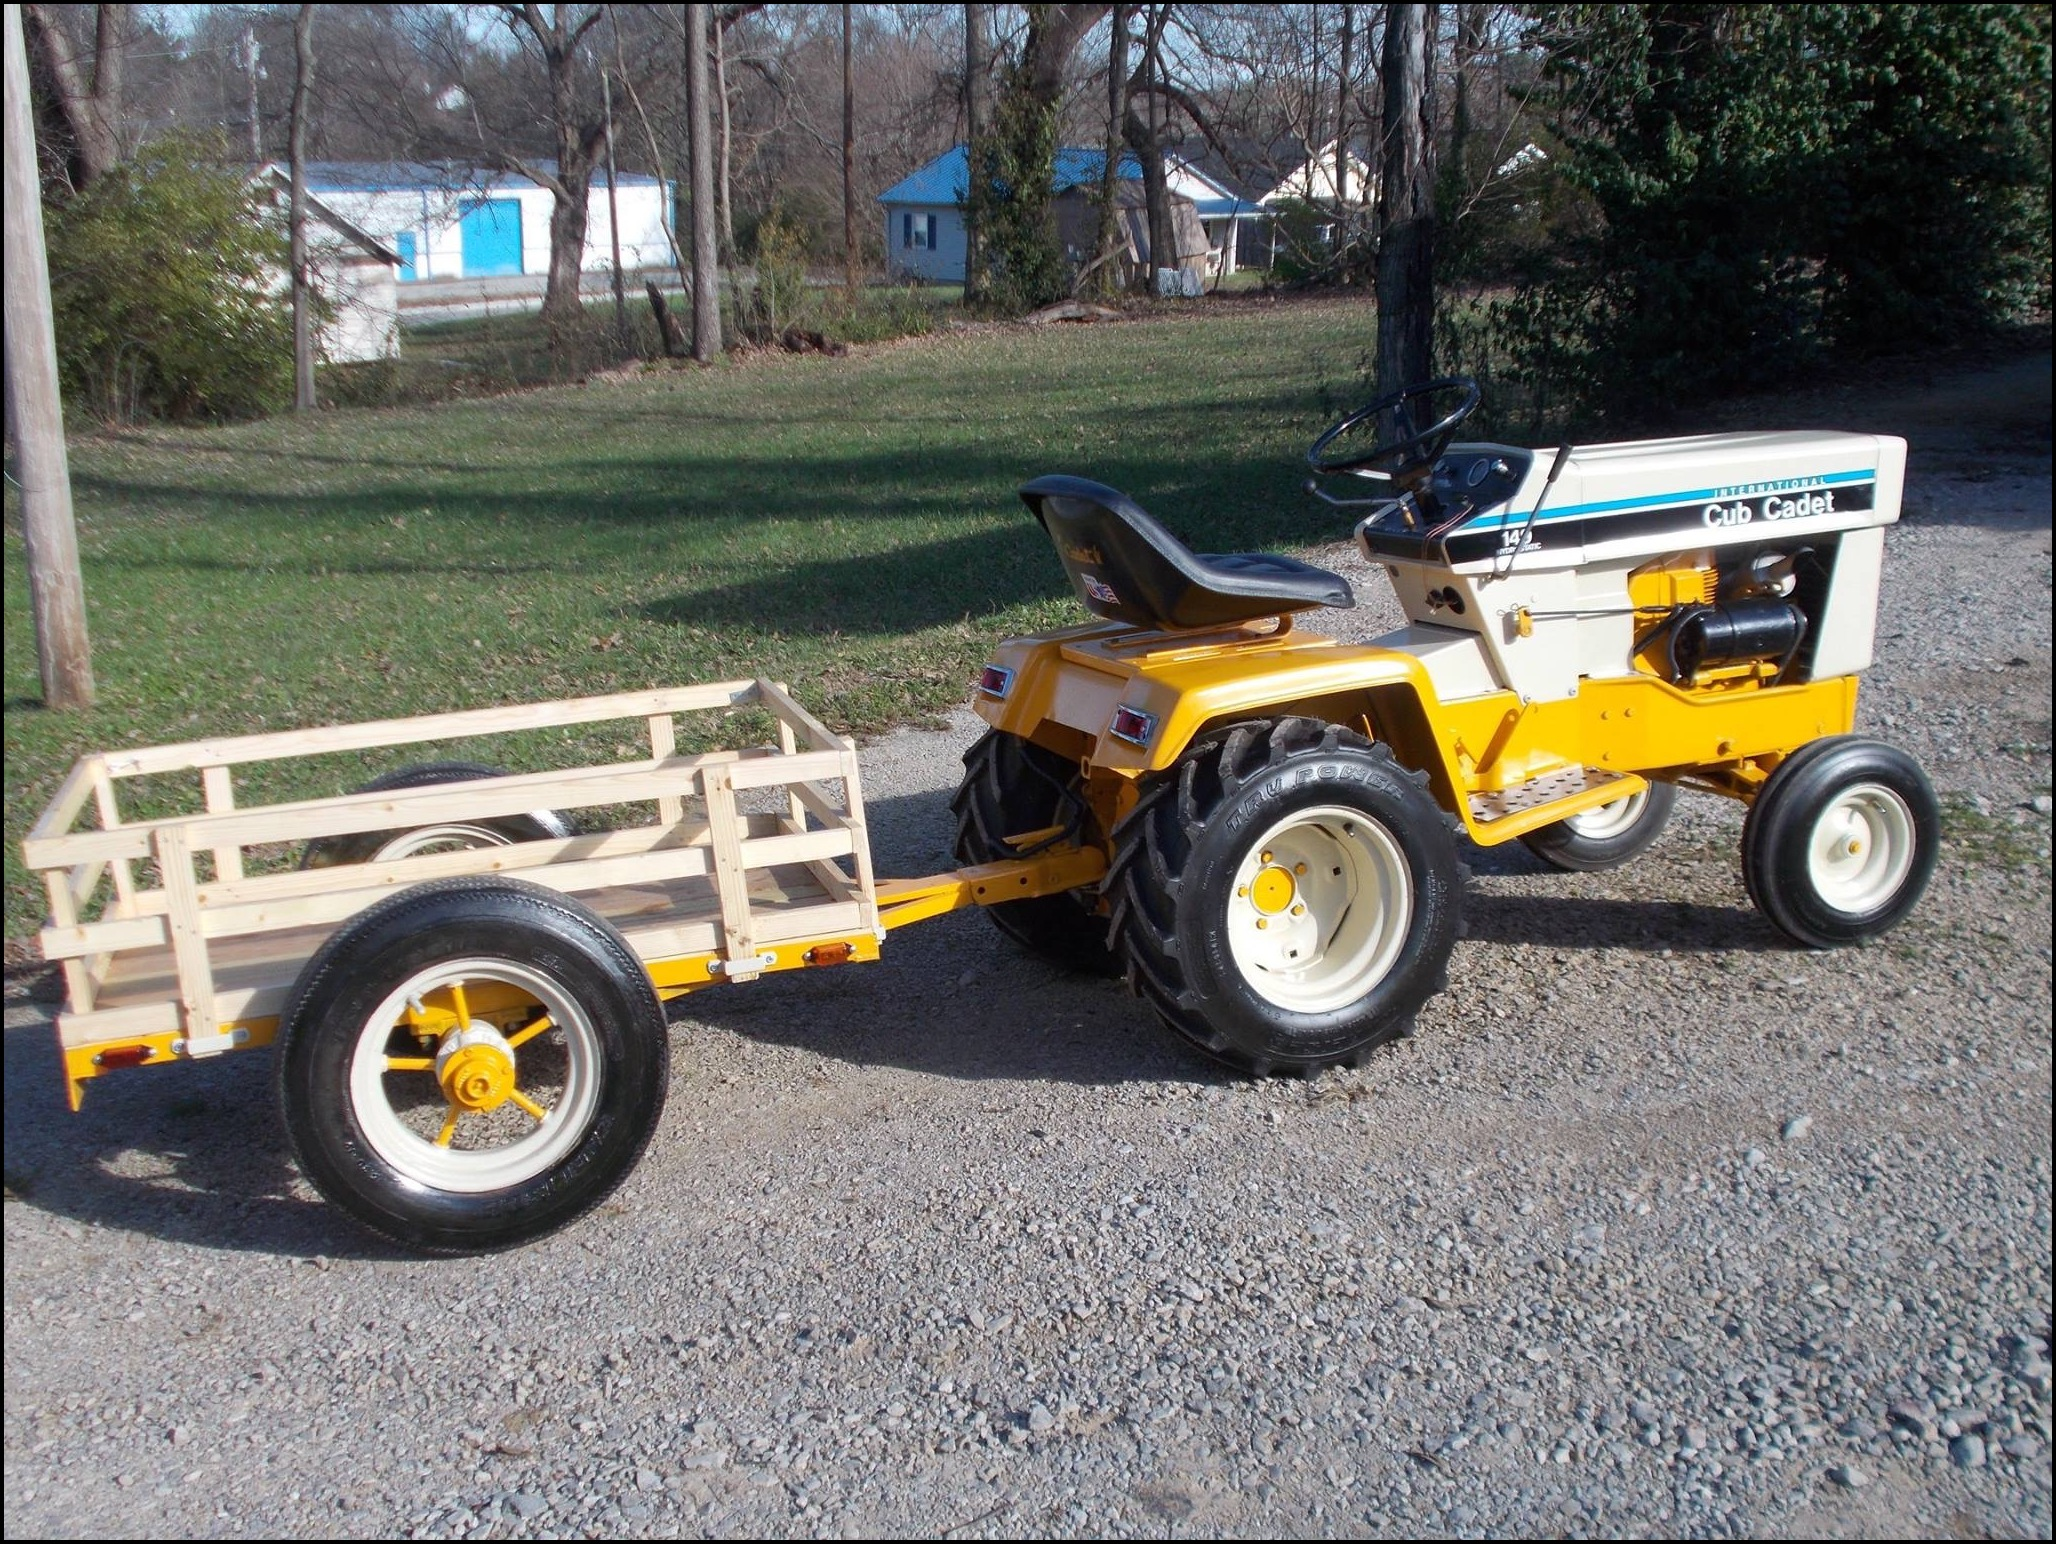 Cub Cadet Garden Tractor Attachments